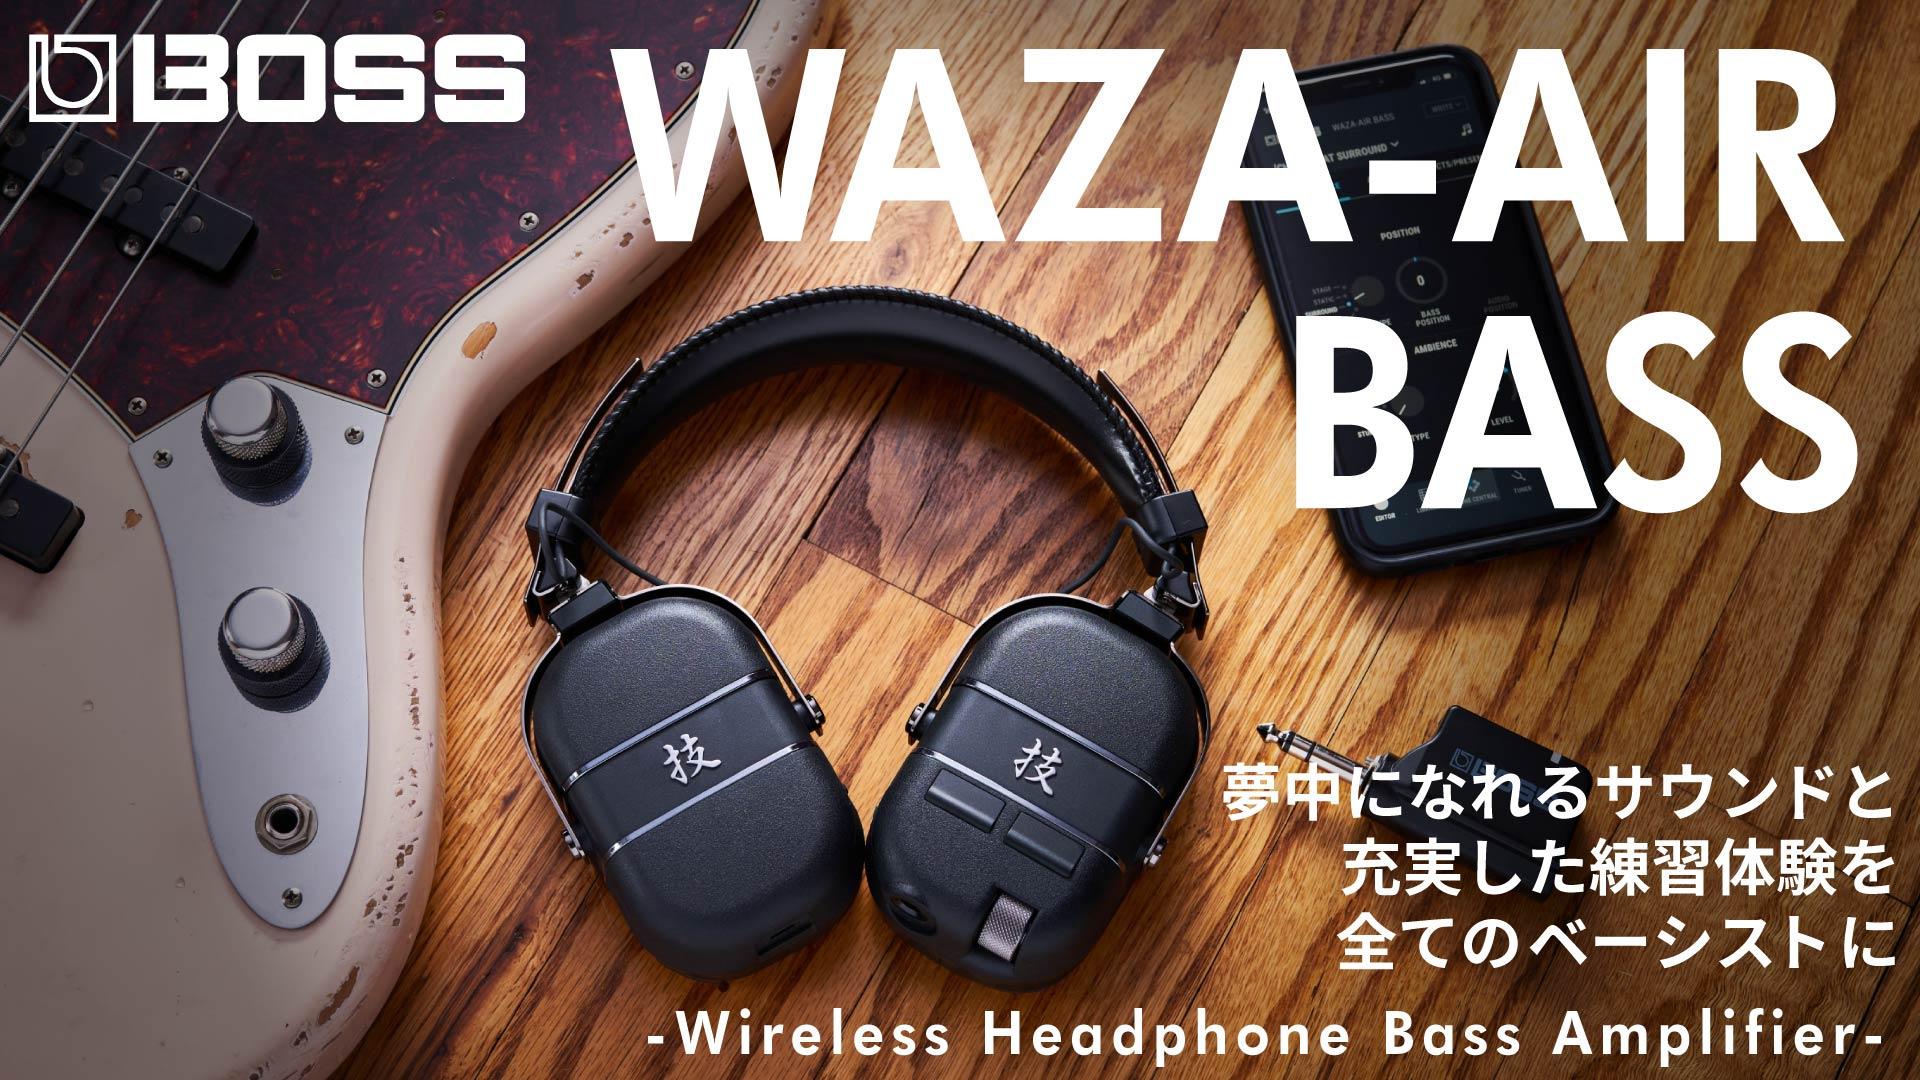 BOSS WAZA-AIR BASS | イケベ楽器店